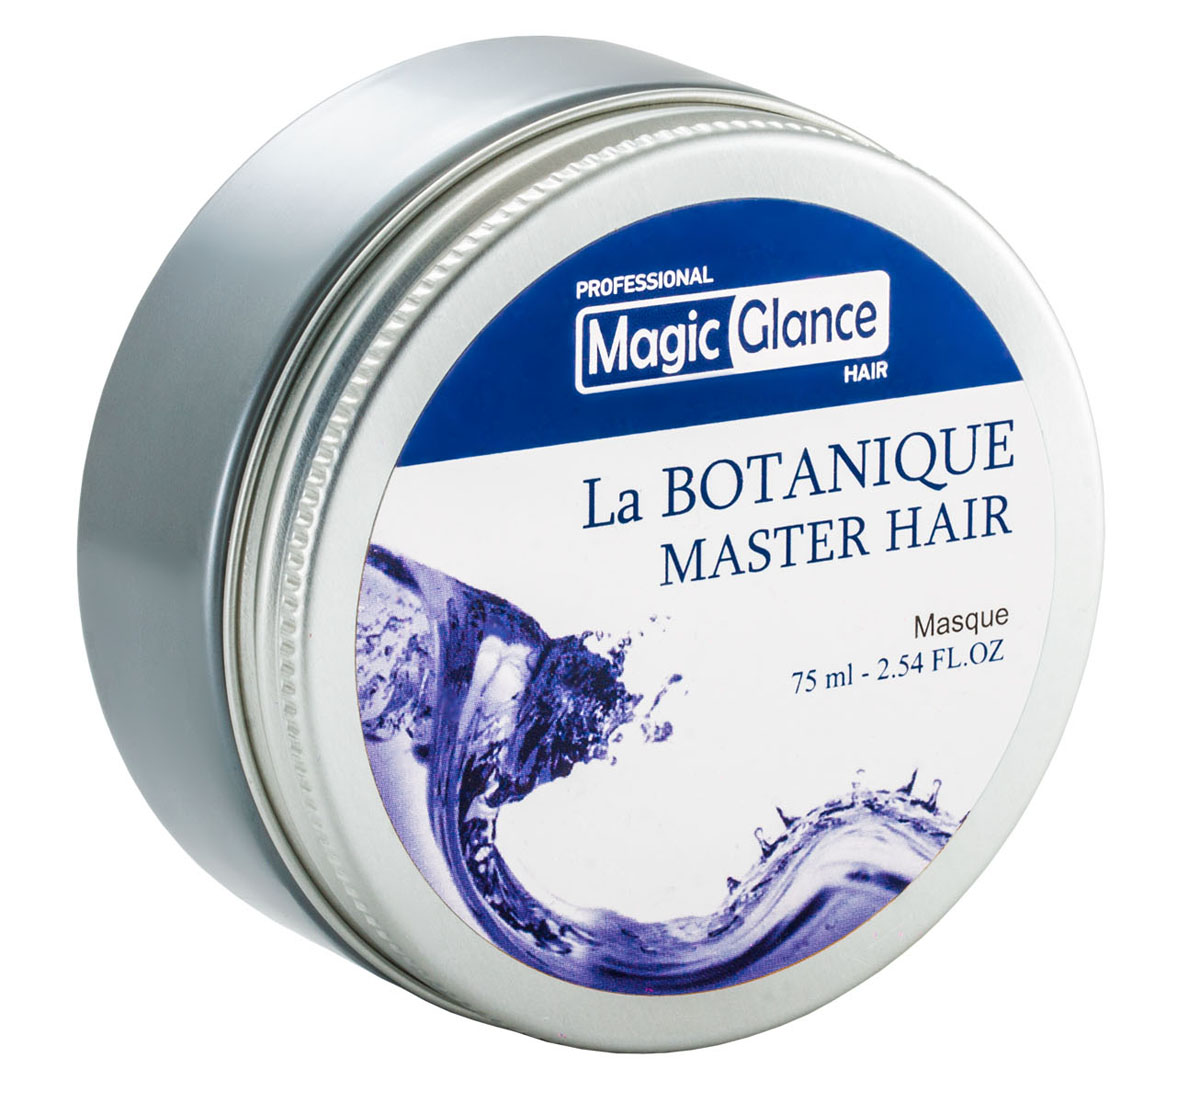 Magic Glance La Botanique Маска от выпадения волос, 75 мл83020211Маска Magic Glance La Botanique Master Hair применяется для предотвращения выпадения волос. Результат заметен уже через 14 дней применения: выпадение волос остановлено